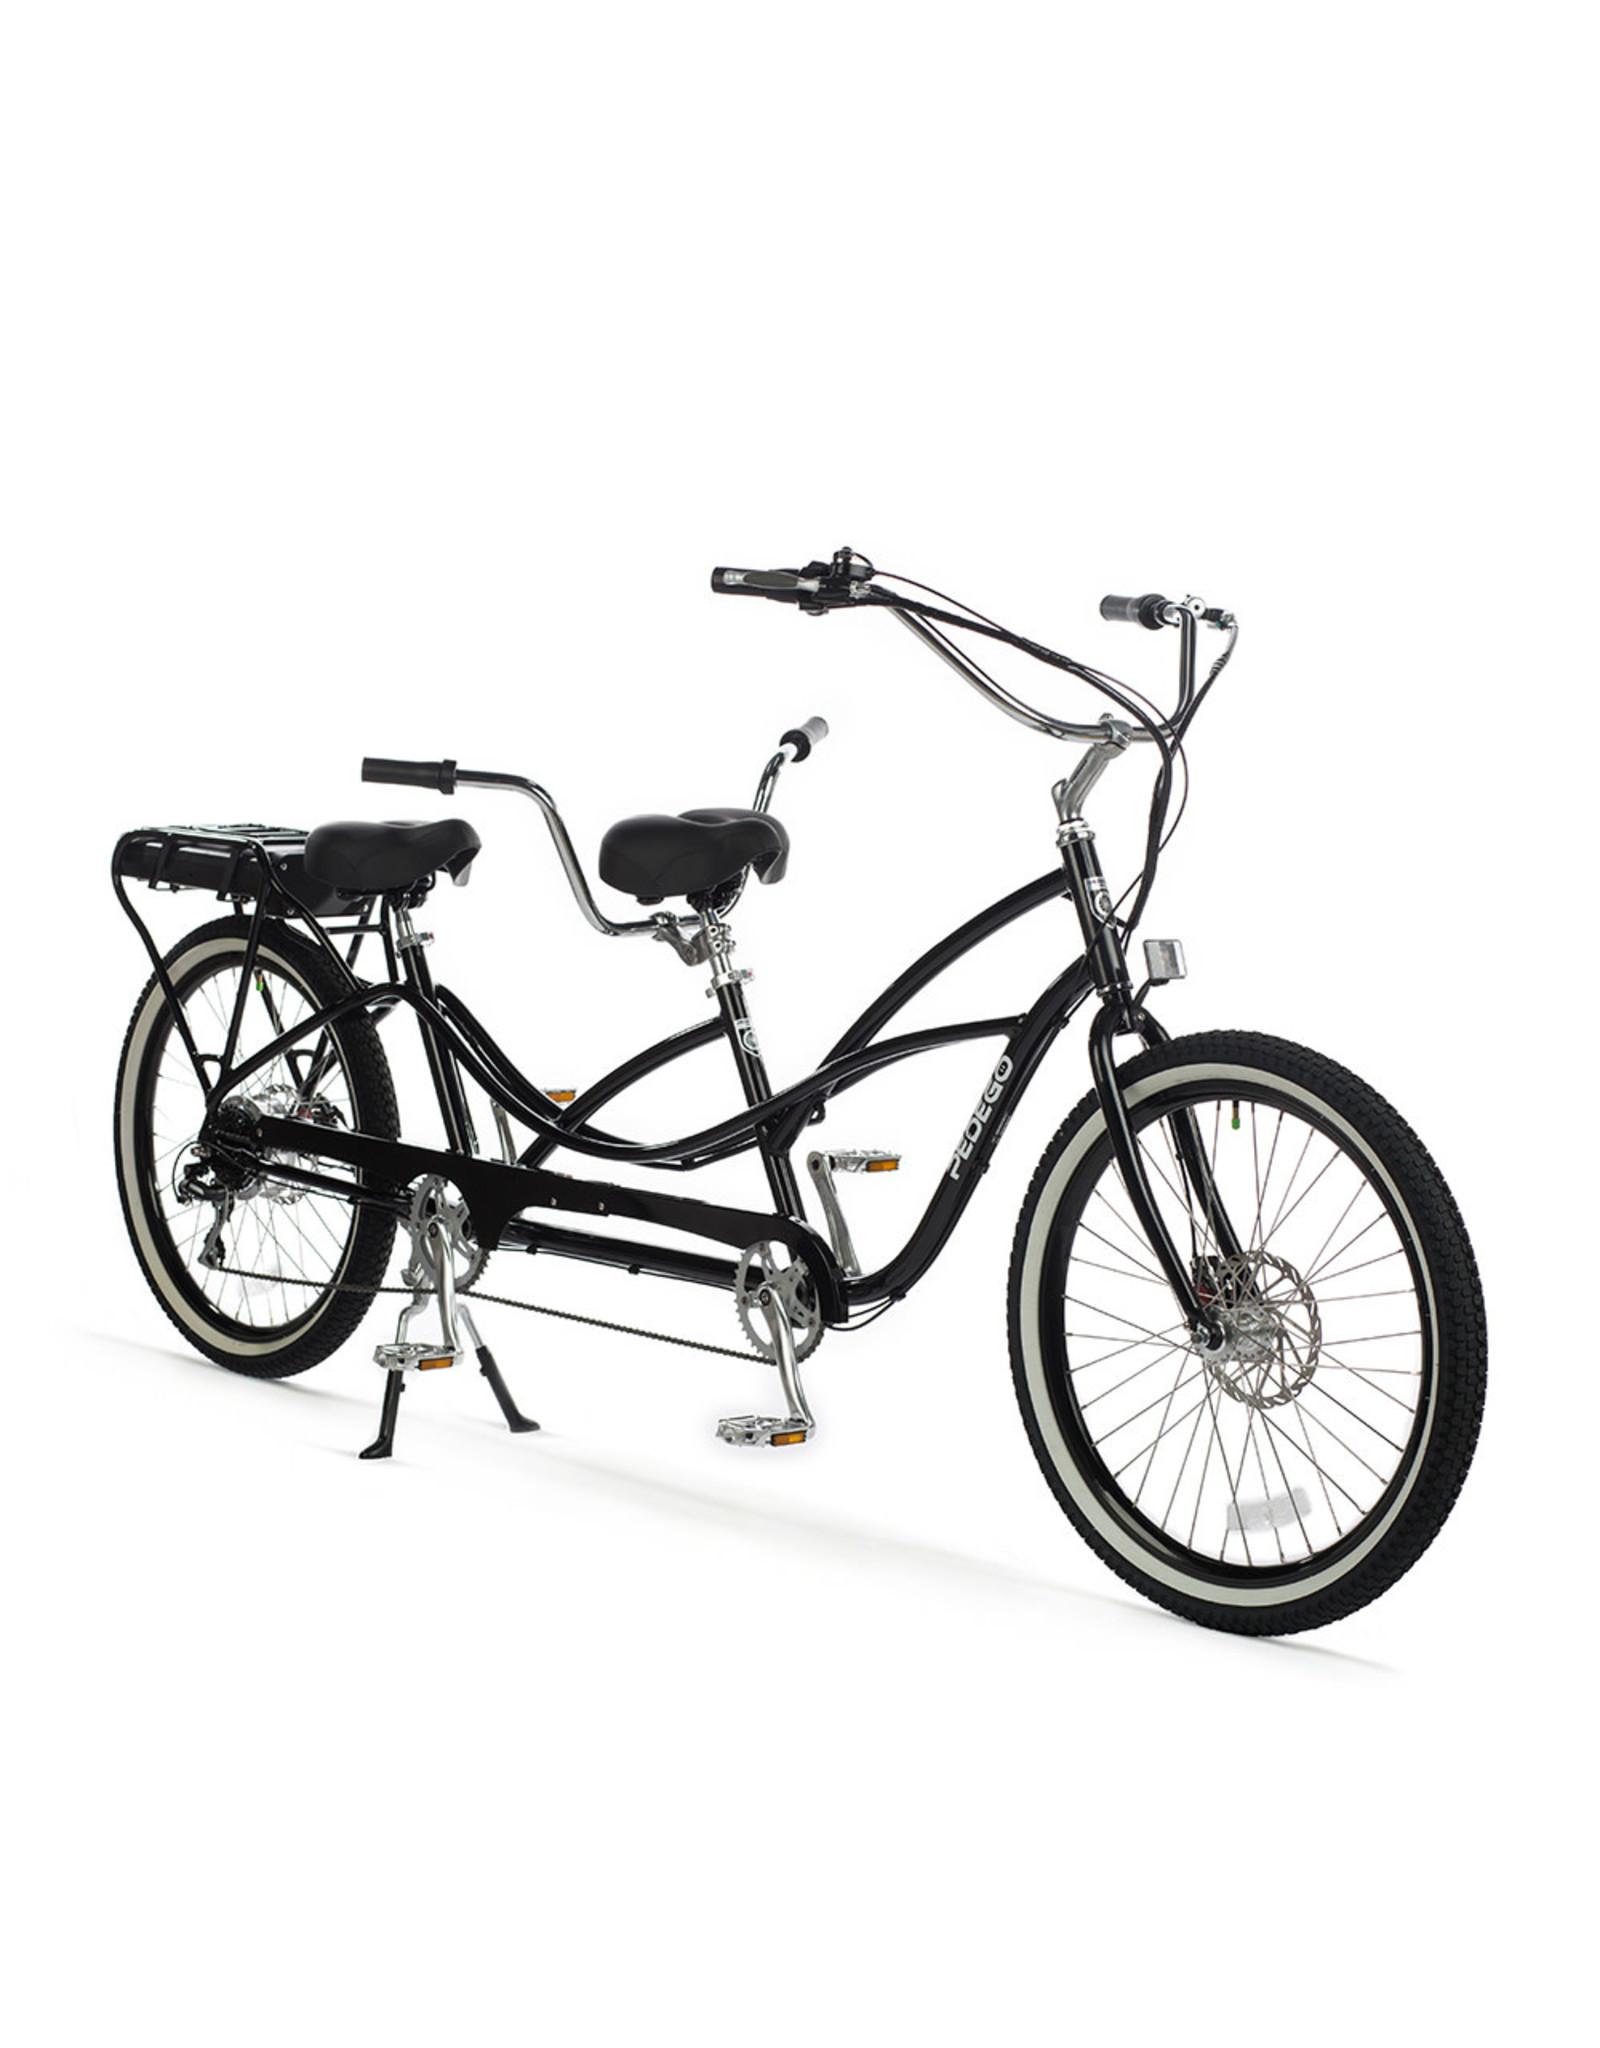 Pedego Electric Bikes Tandem (Used)